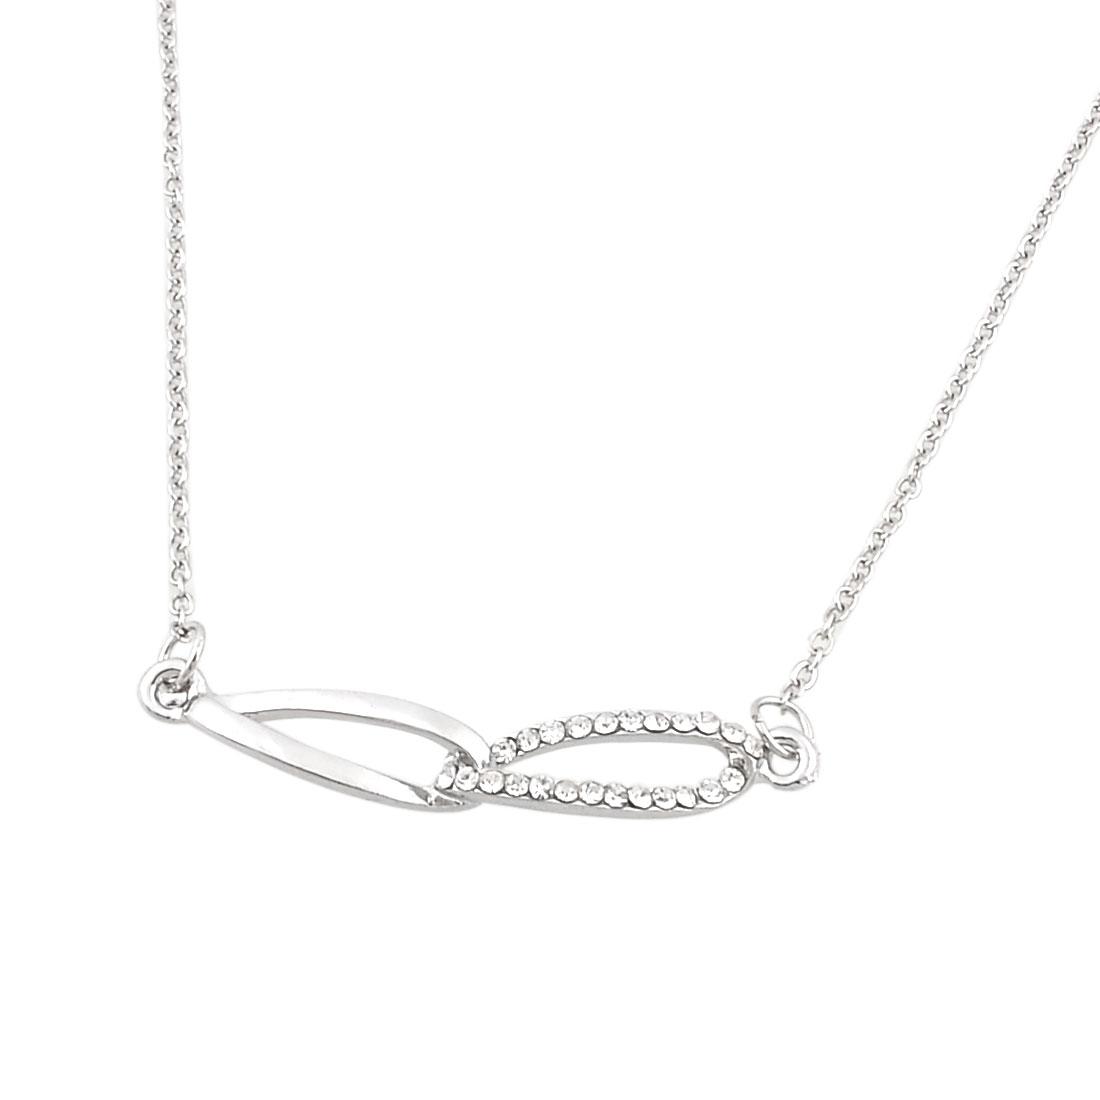 Lady Mini Rhinestones Glasses Design Pendant Adjustable Metal Chain Necklace Silver Tone